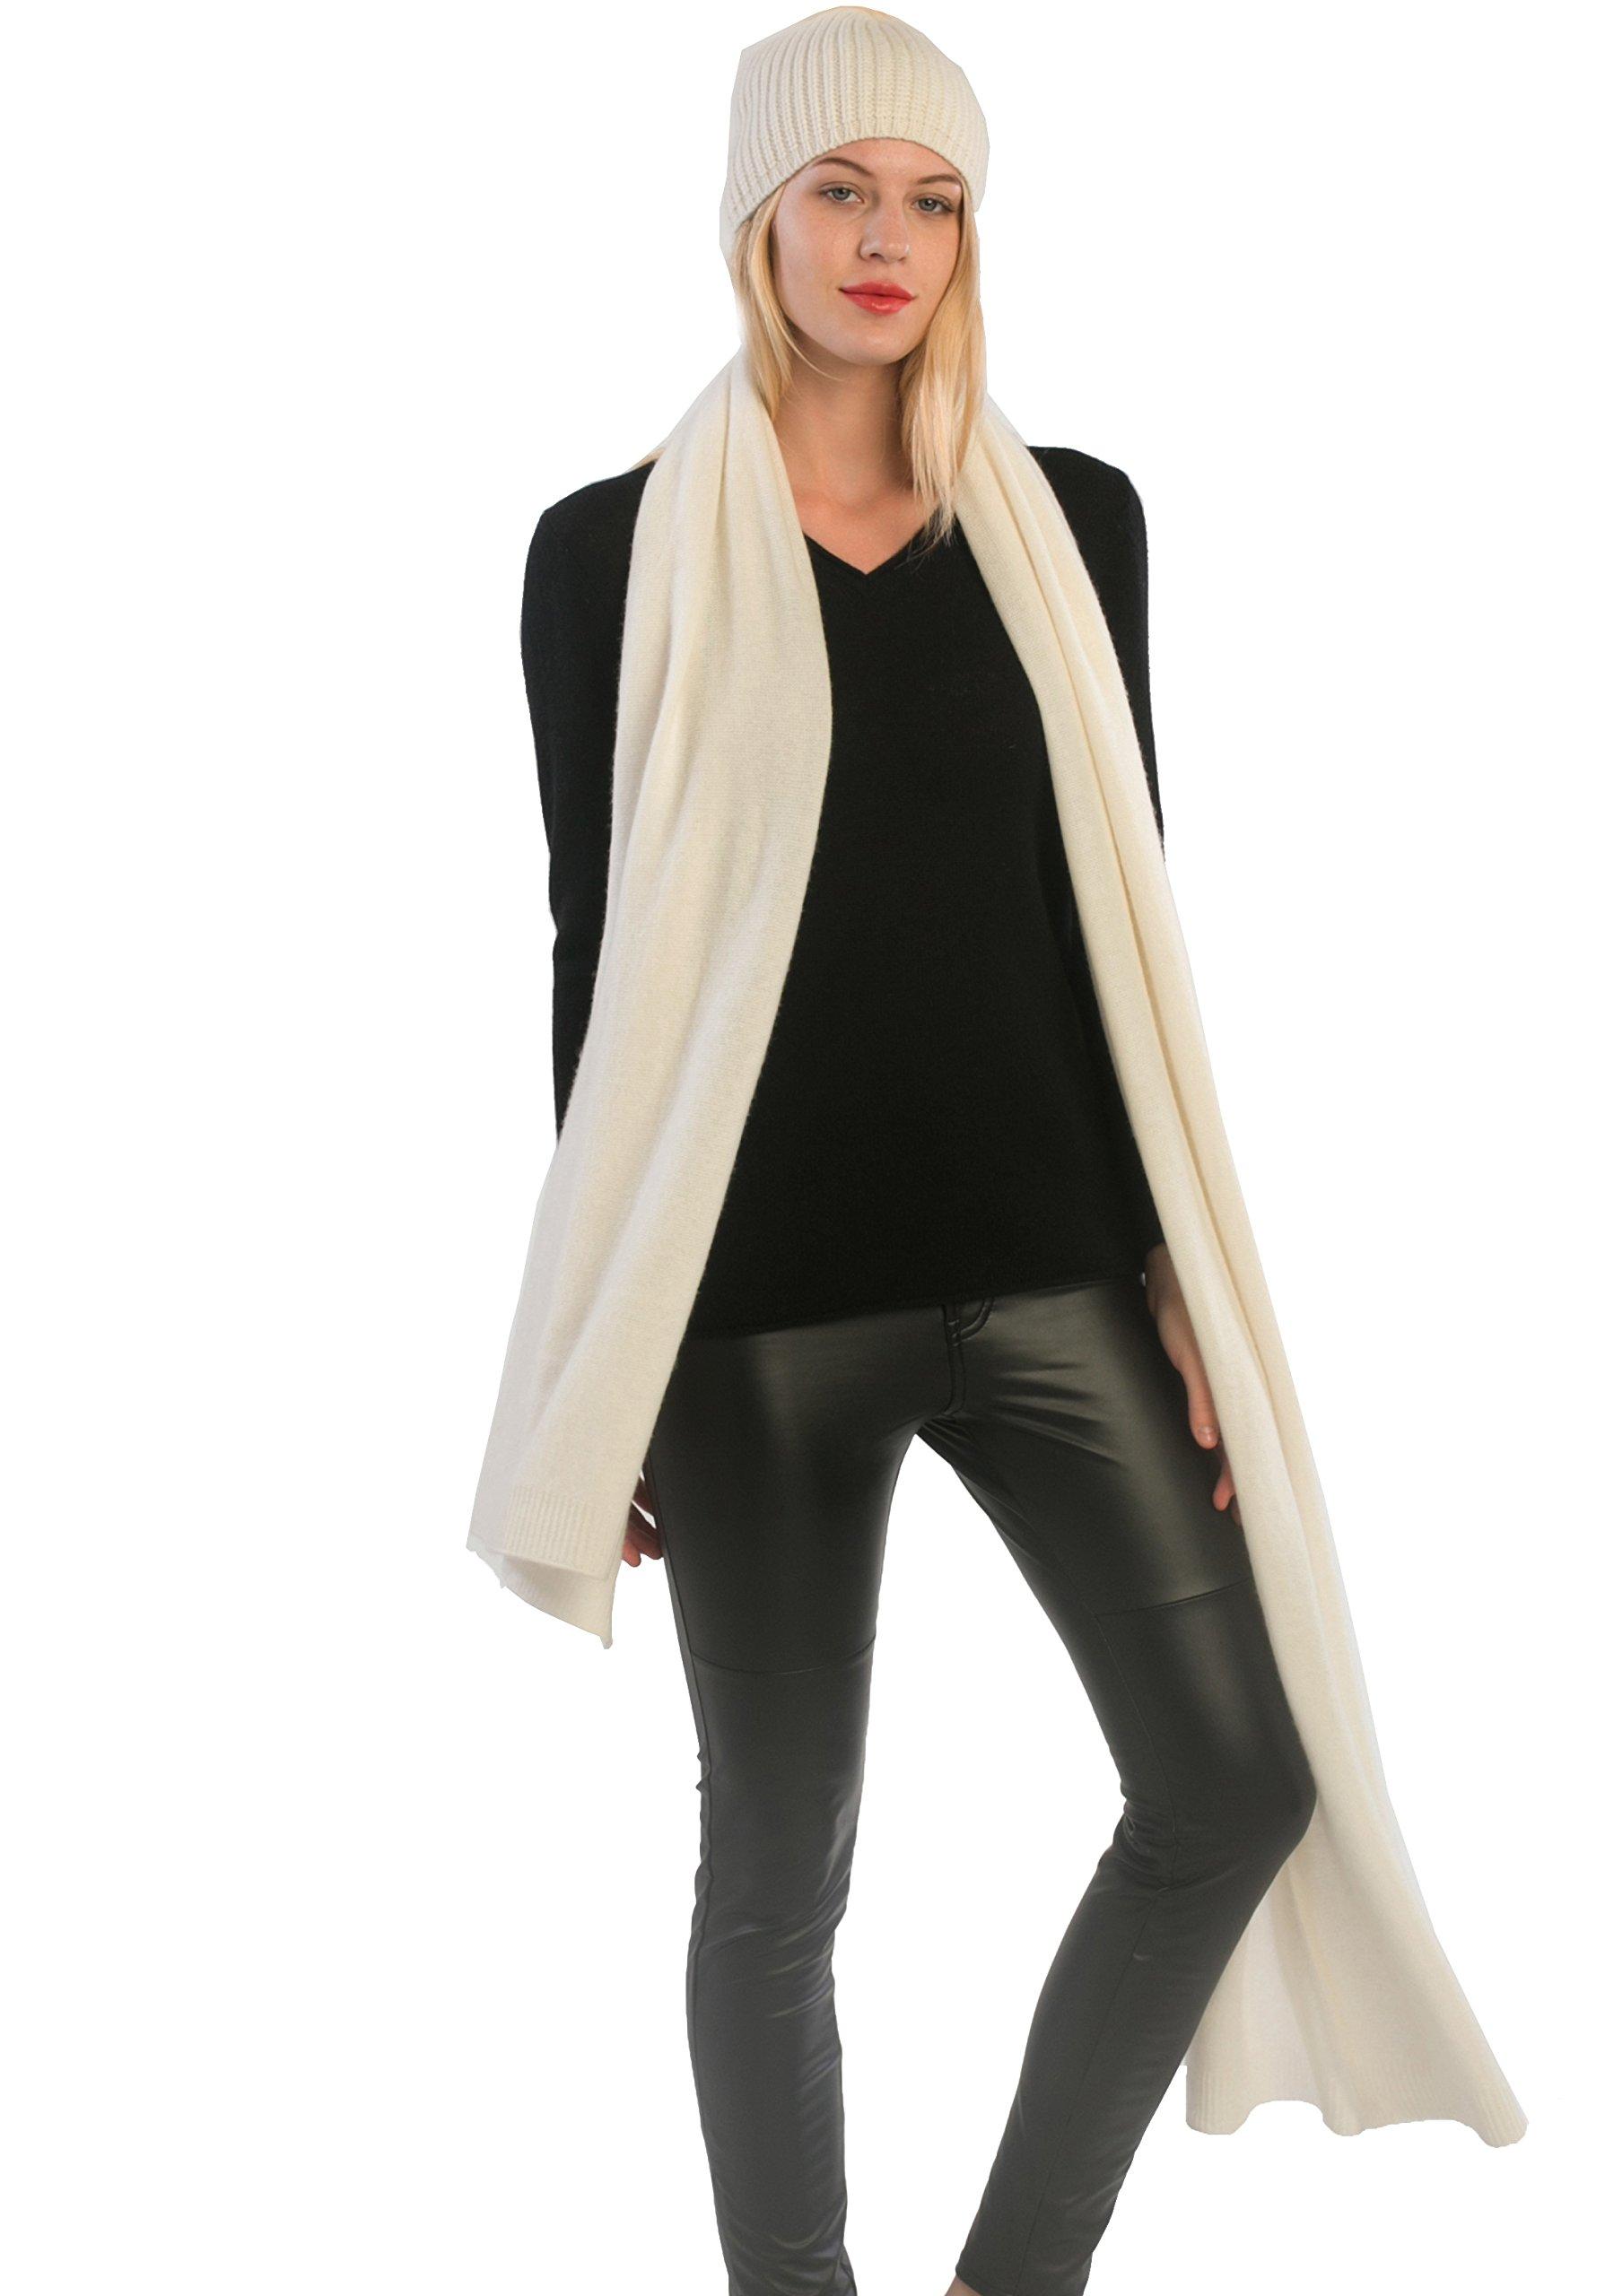 cashmere 4 U Women's 100% Cashmere Wrap Shawl Stole Extra Large Scarf (Ecru)